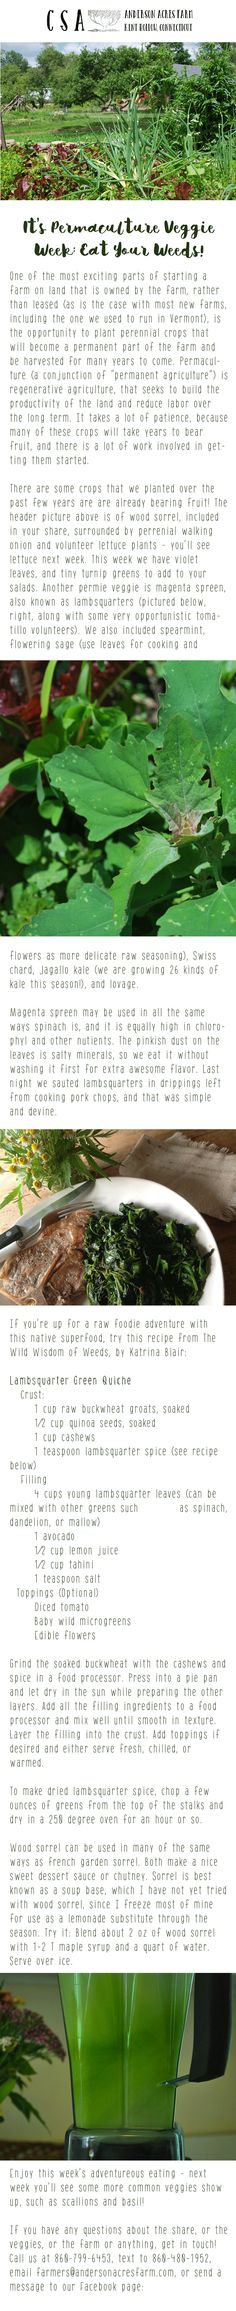 It's #Permaculture #Veggie Week: #Eat Your #Weeds! #Food #Ag #OrganicFarm #Connecticut #Kent #Organics #FarmFresh #FarmToPlate #Animals #Goats #YearRoundFarms #AgBlog #Recipes #FarmLife #KnowFarmsKnowFoods #Farmers #CTFarms